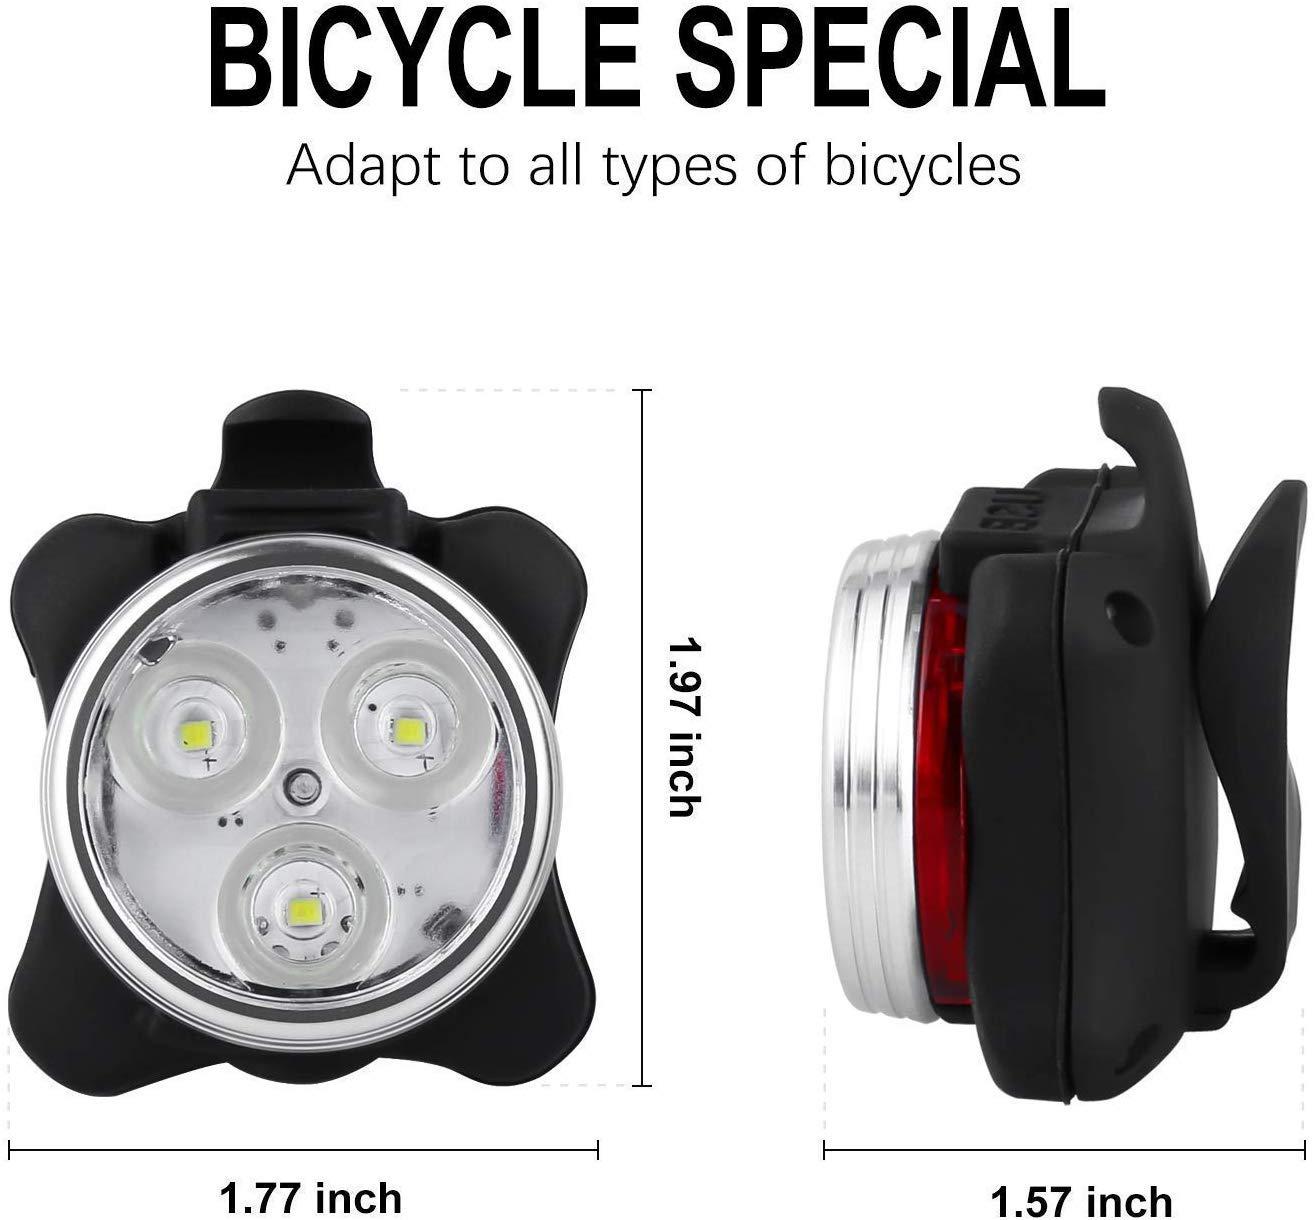 DKINs LED Bicicleta Luces Set Bicicleta USB Recargable l/ámpara Linterna Ciclismo Impermeable Luces Establece con Cable USB Luces Cabeza Rojo Blanco